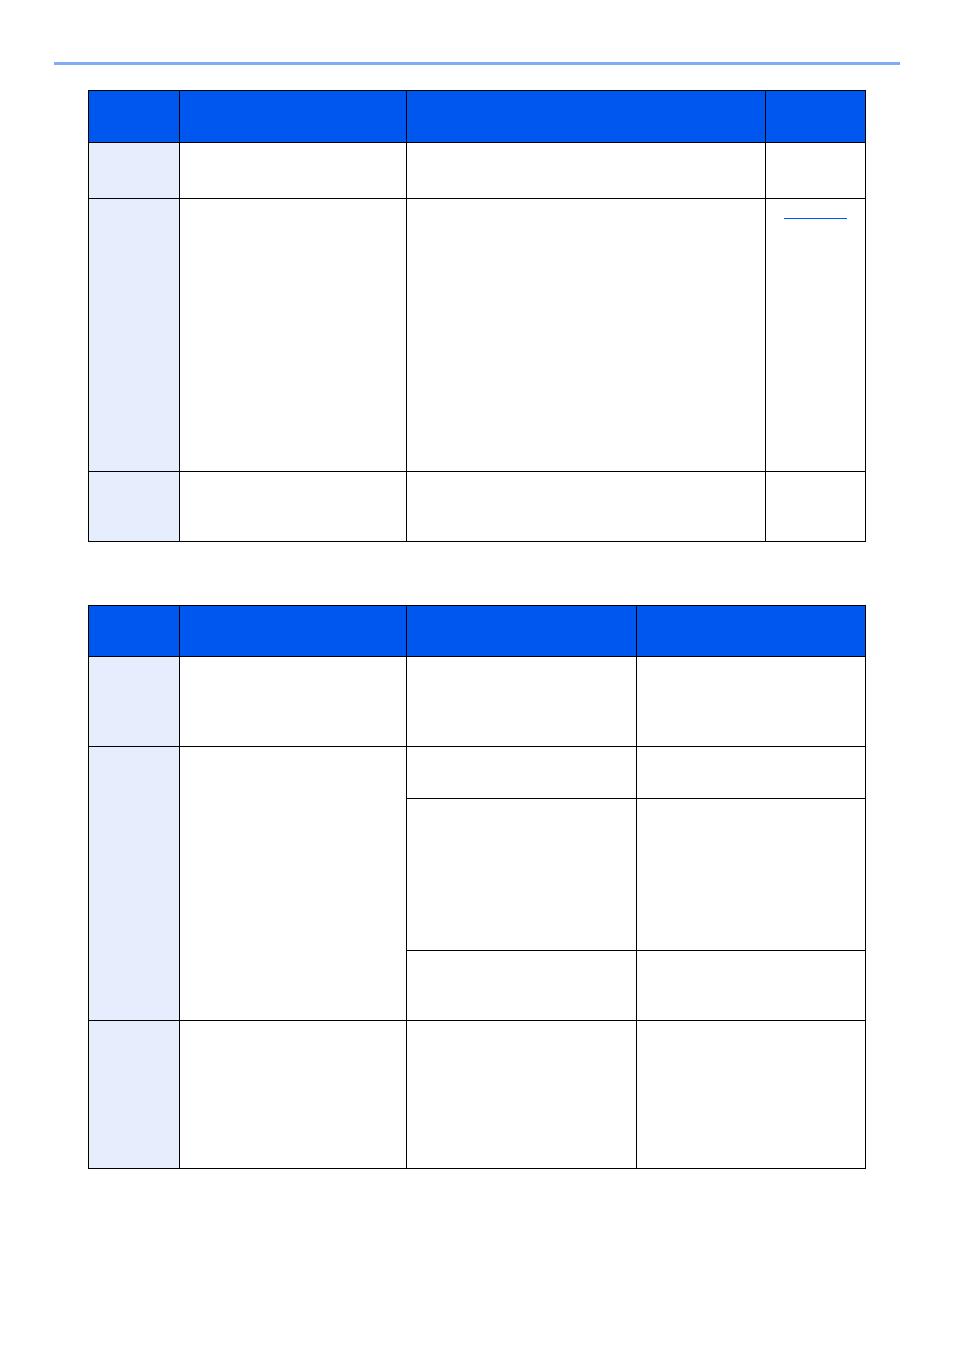 Responding to printing system error | Kyocera TASKalfa 2552ci User